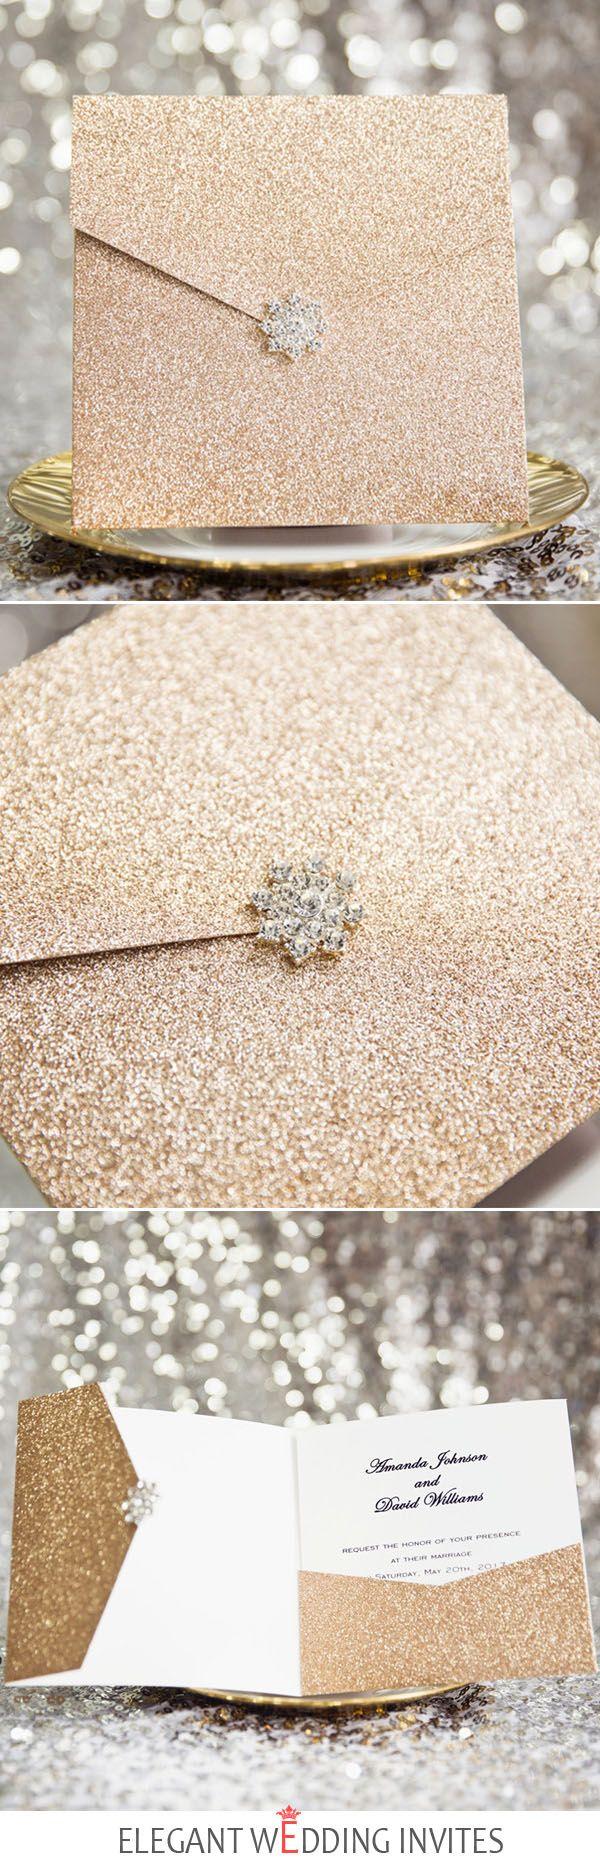 luxurious rose gold glittery glam pocket wedding invitations with rhinestone buckle